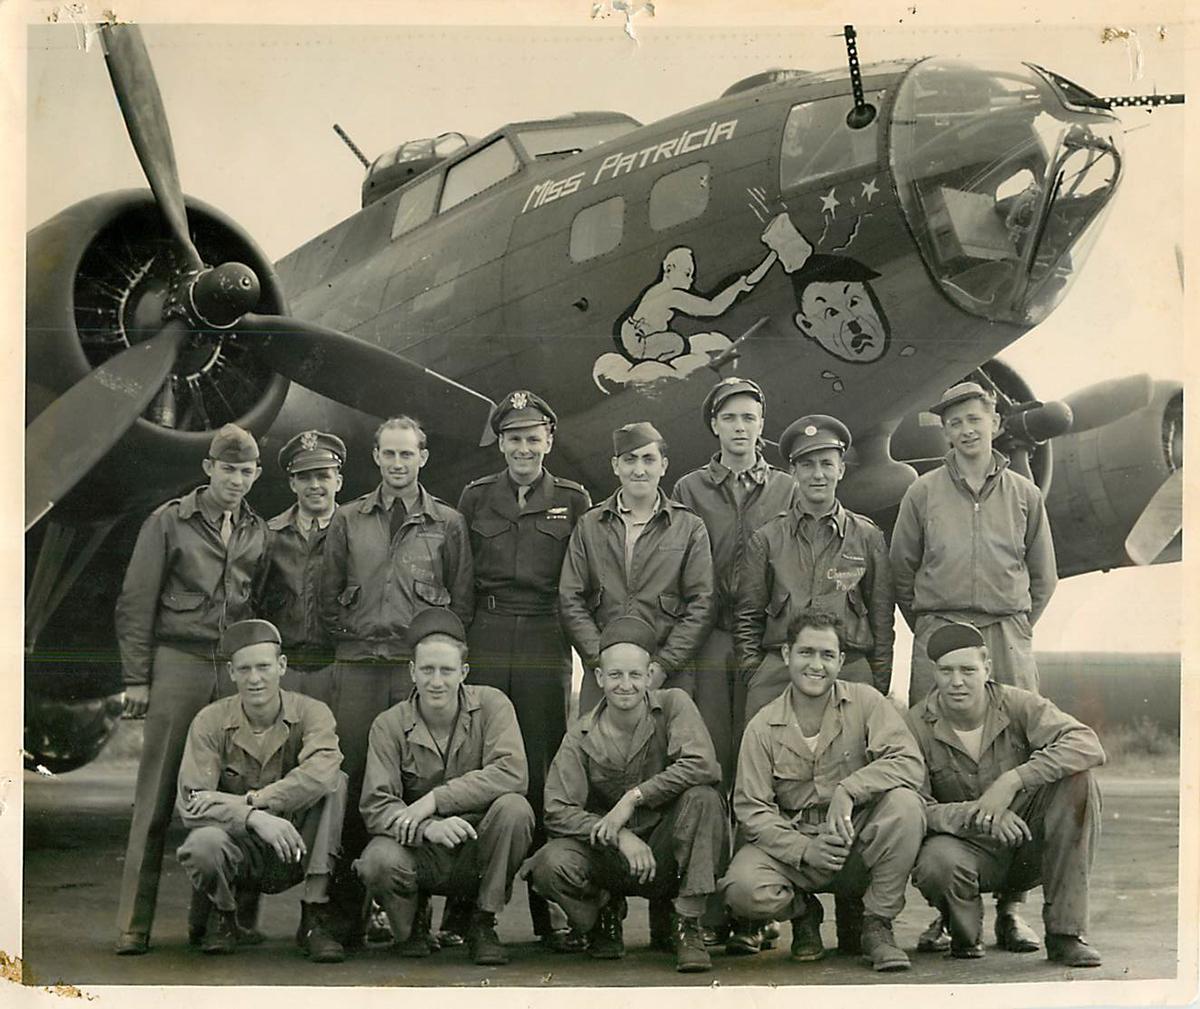 B-17 42-29930